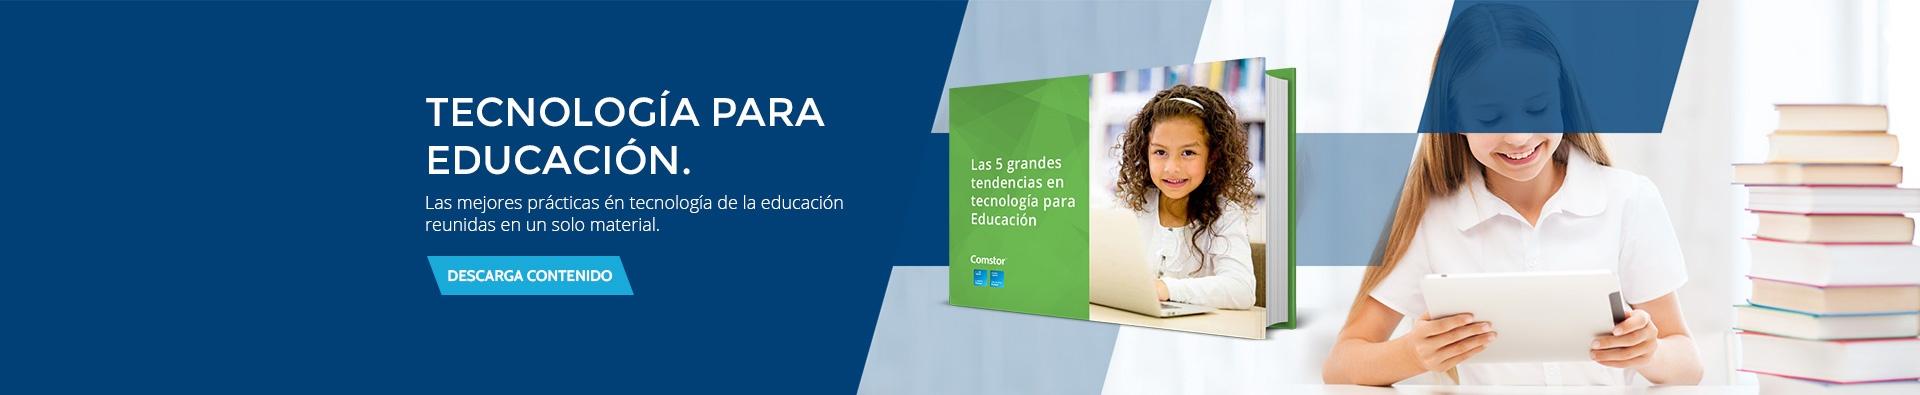 mainbanner_teconologia_para_educacion.jpg